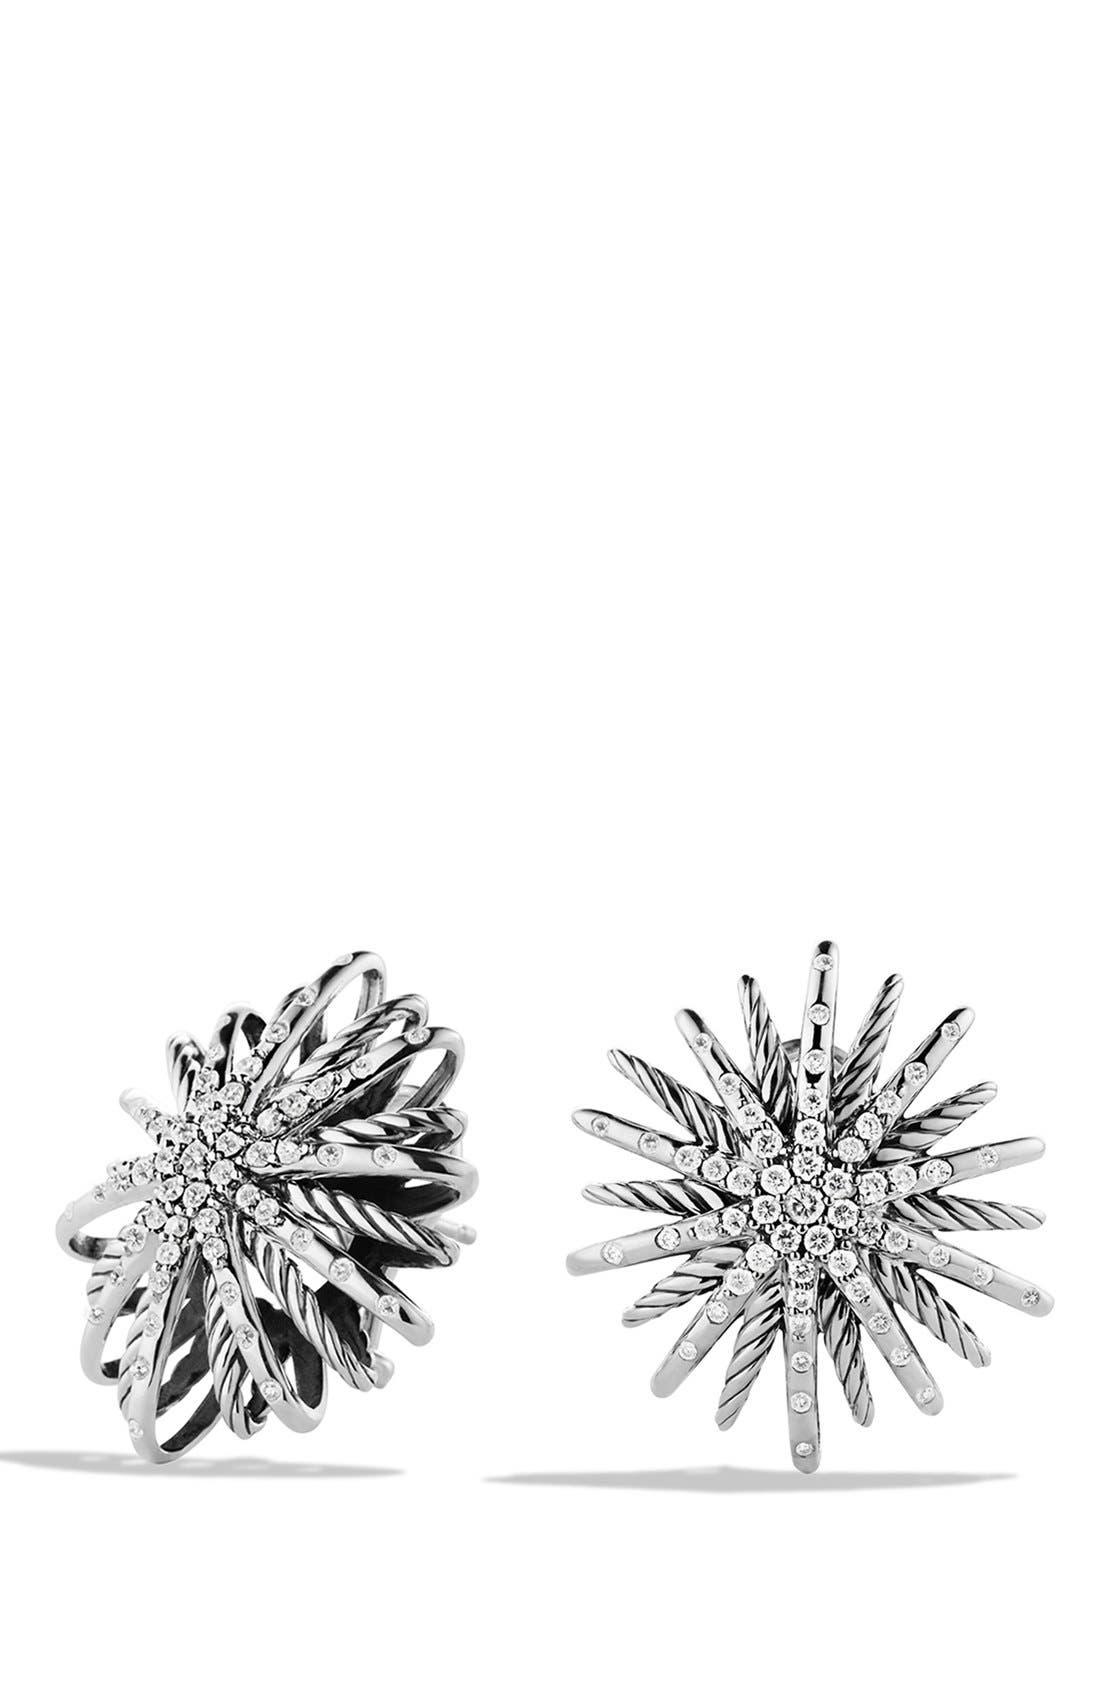 Alternate Image 1 Selected - David Yurman 'Starburst' Earrings with Diamonds